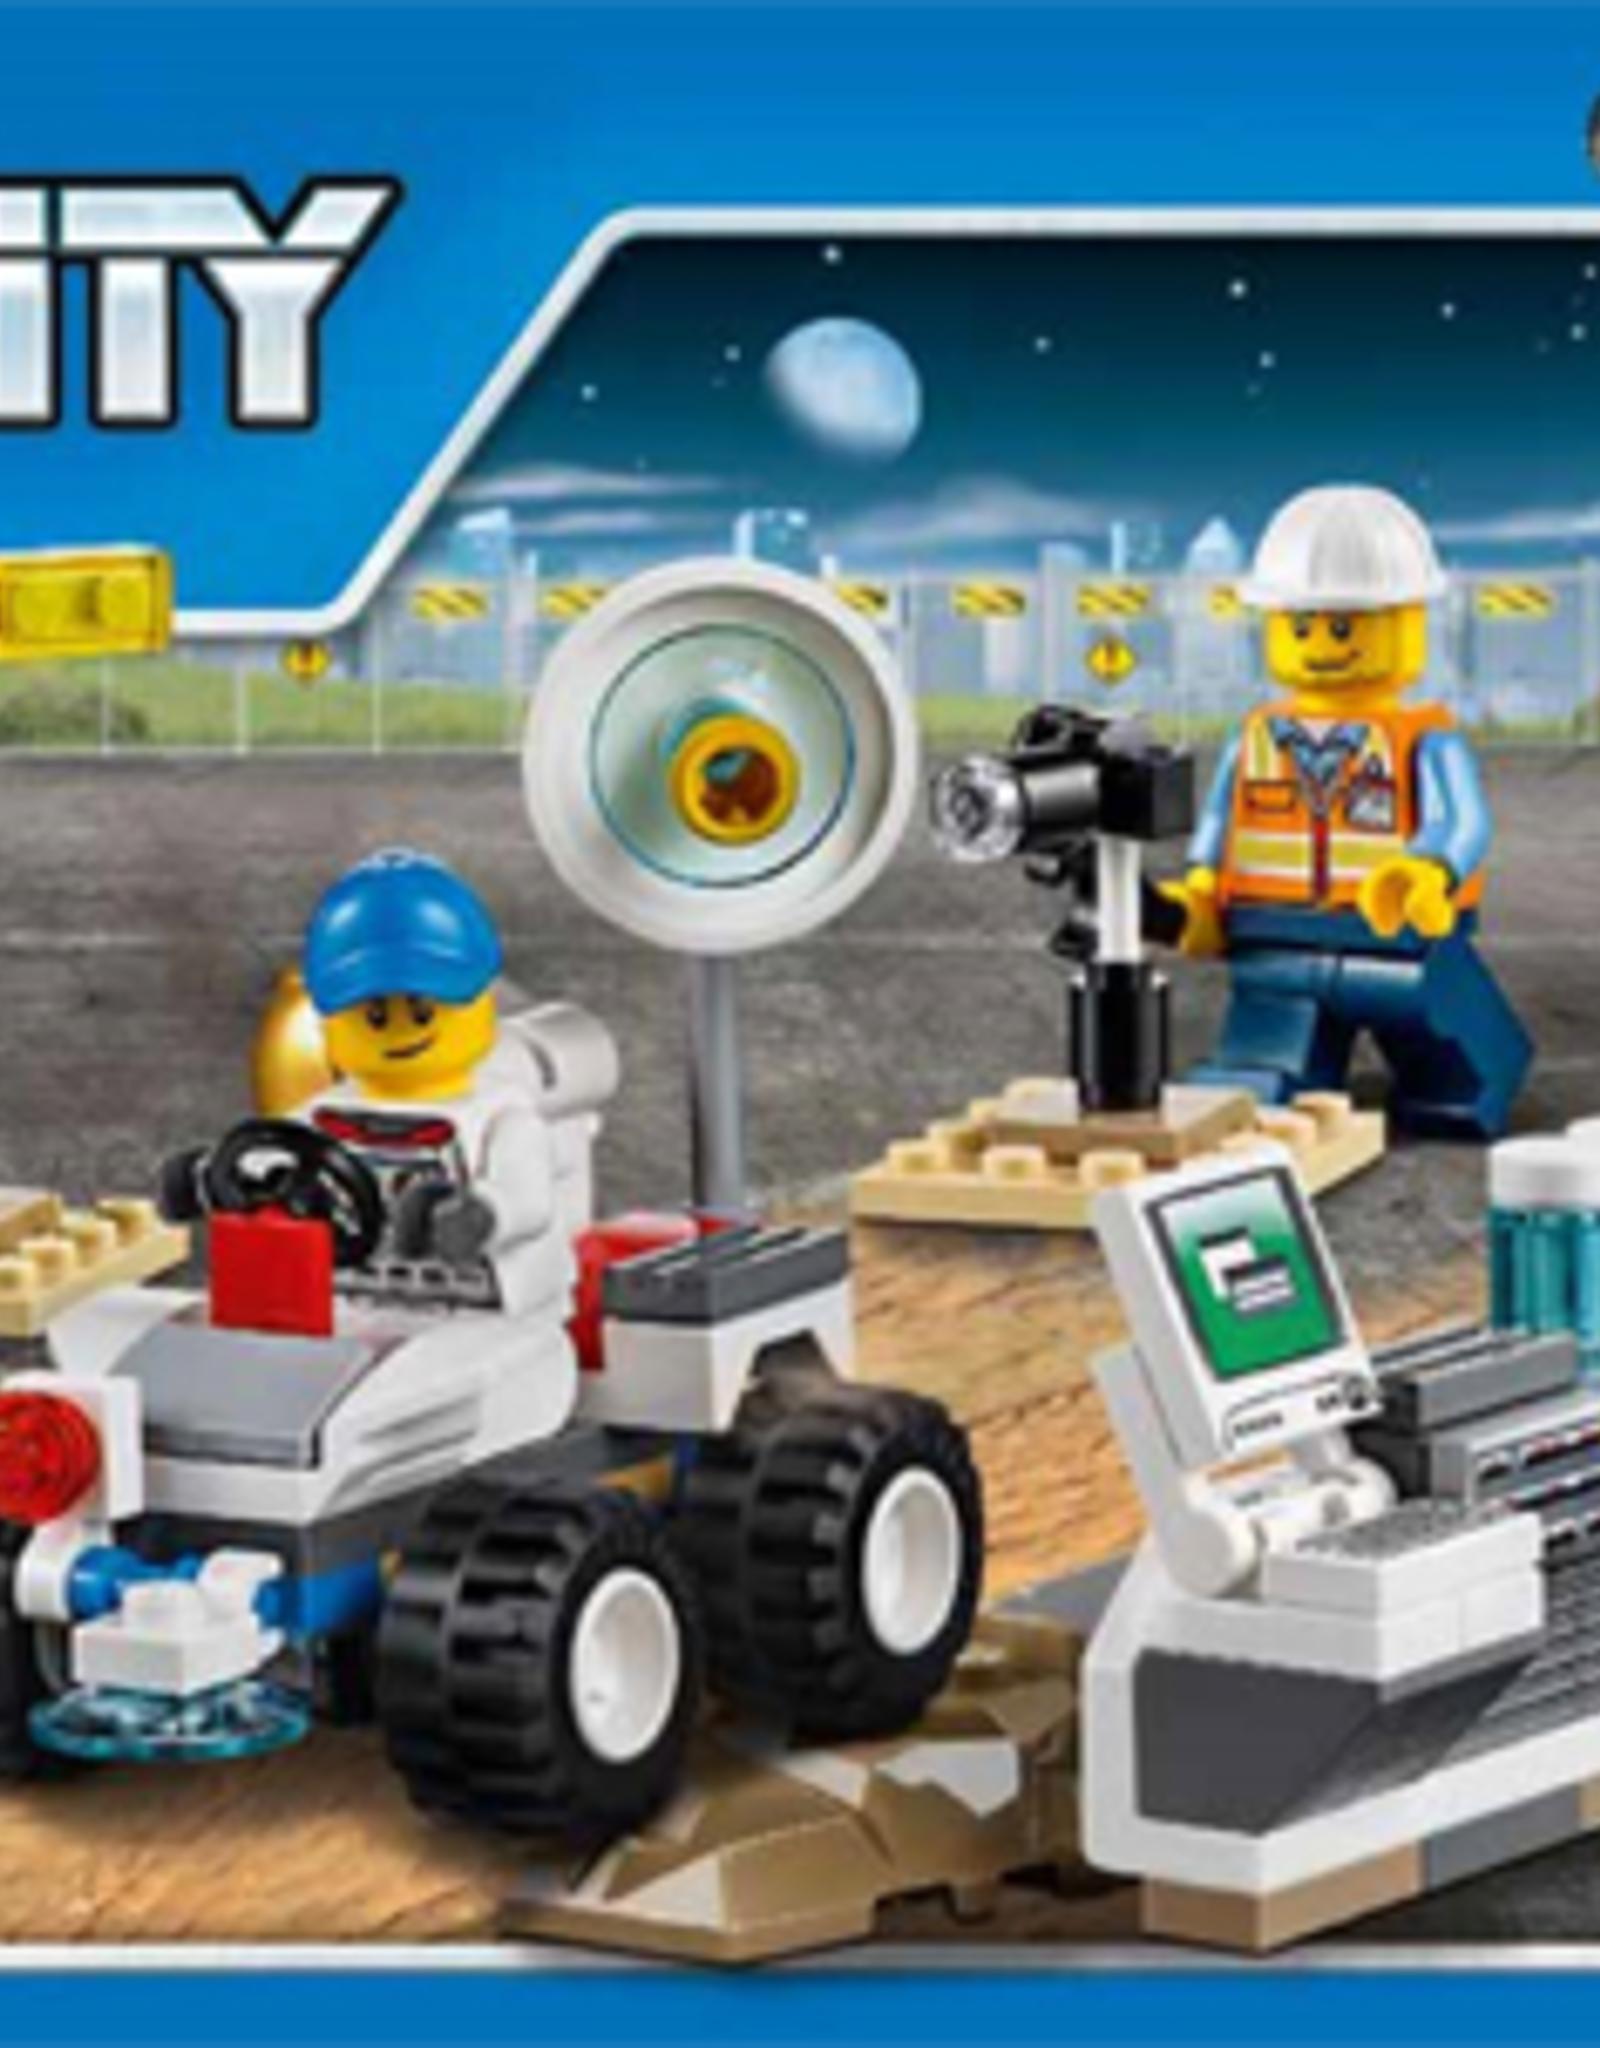 LEGO LEGO 60077 Space Starter Set CITY